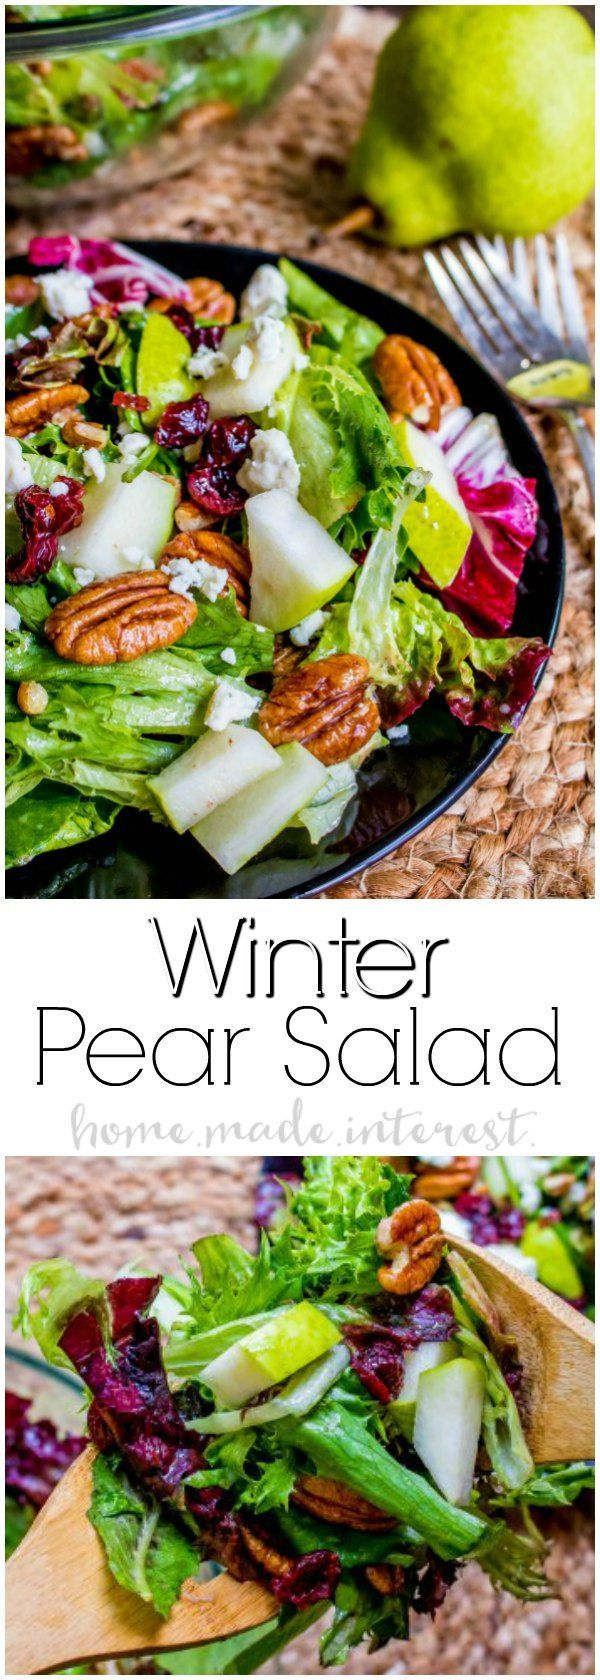 Winter Salad with Homemade Vinaigrette